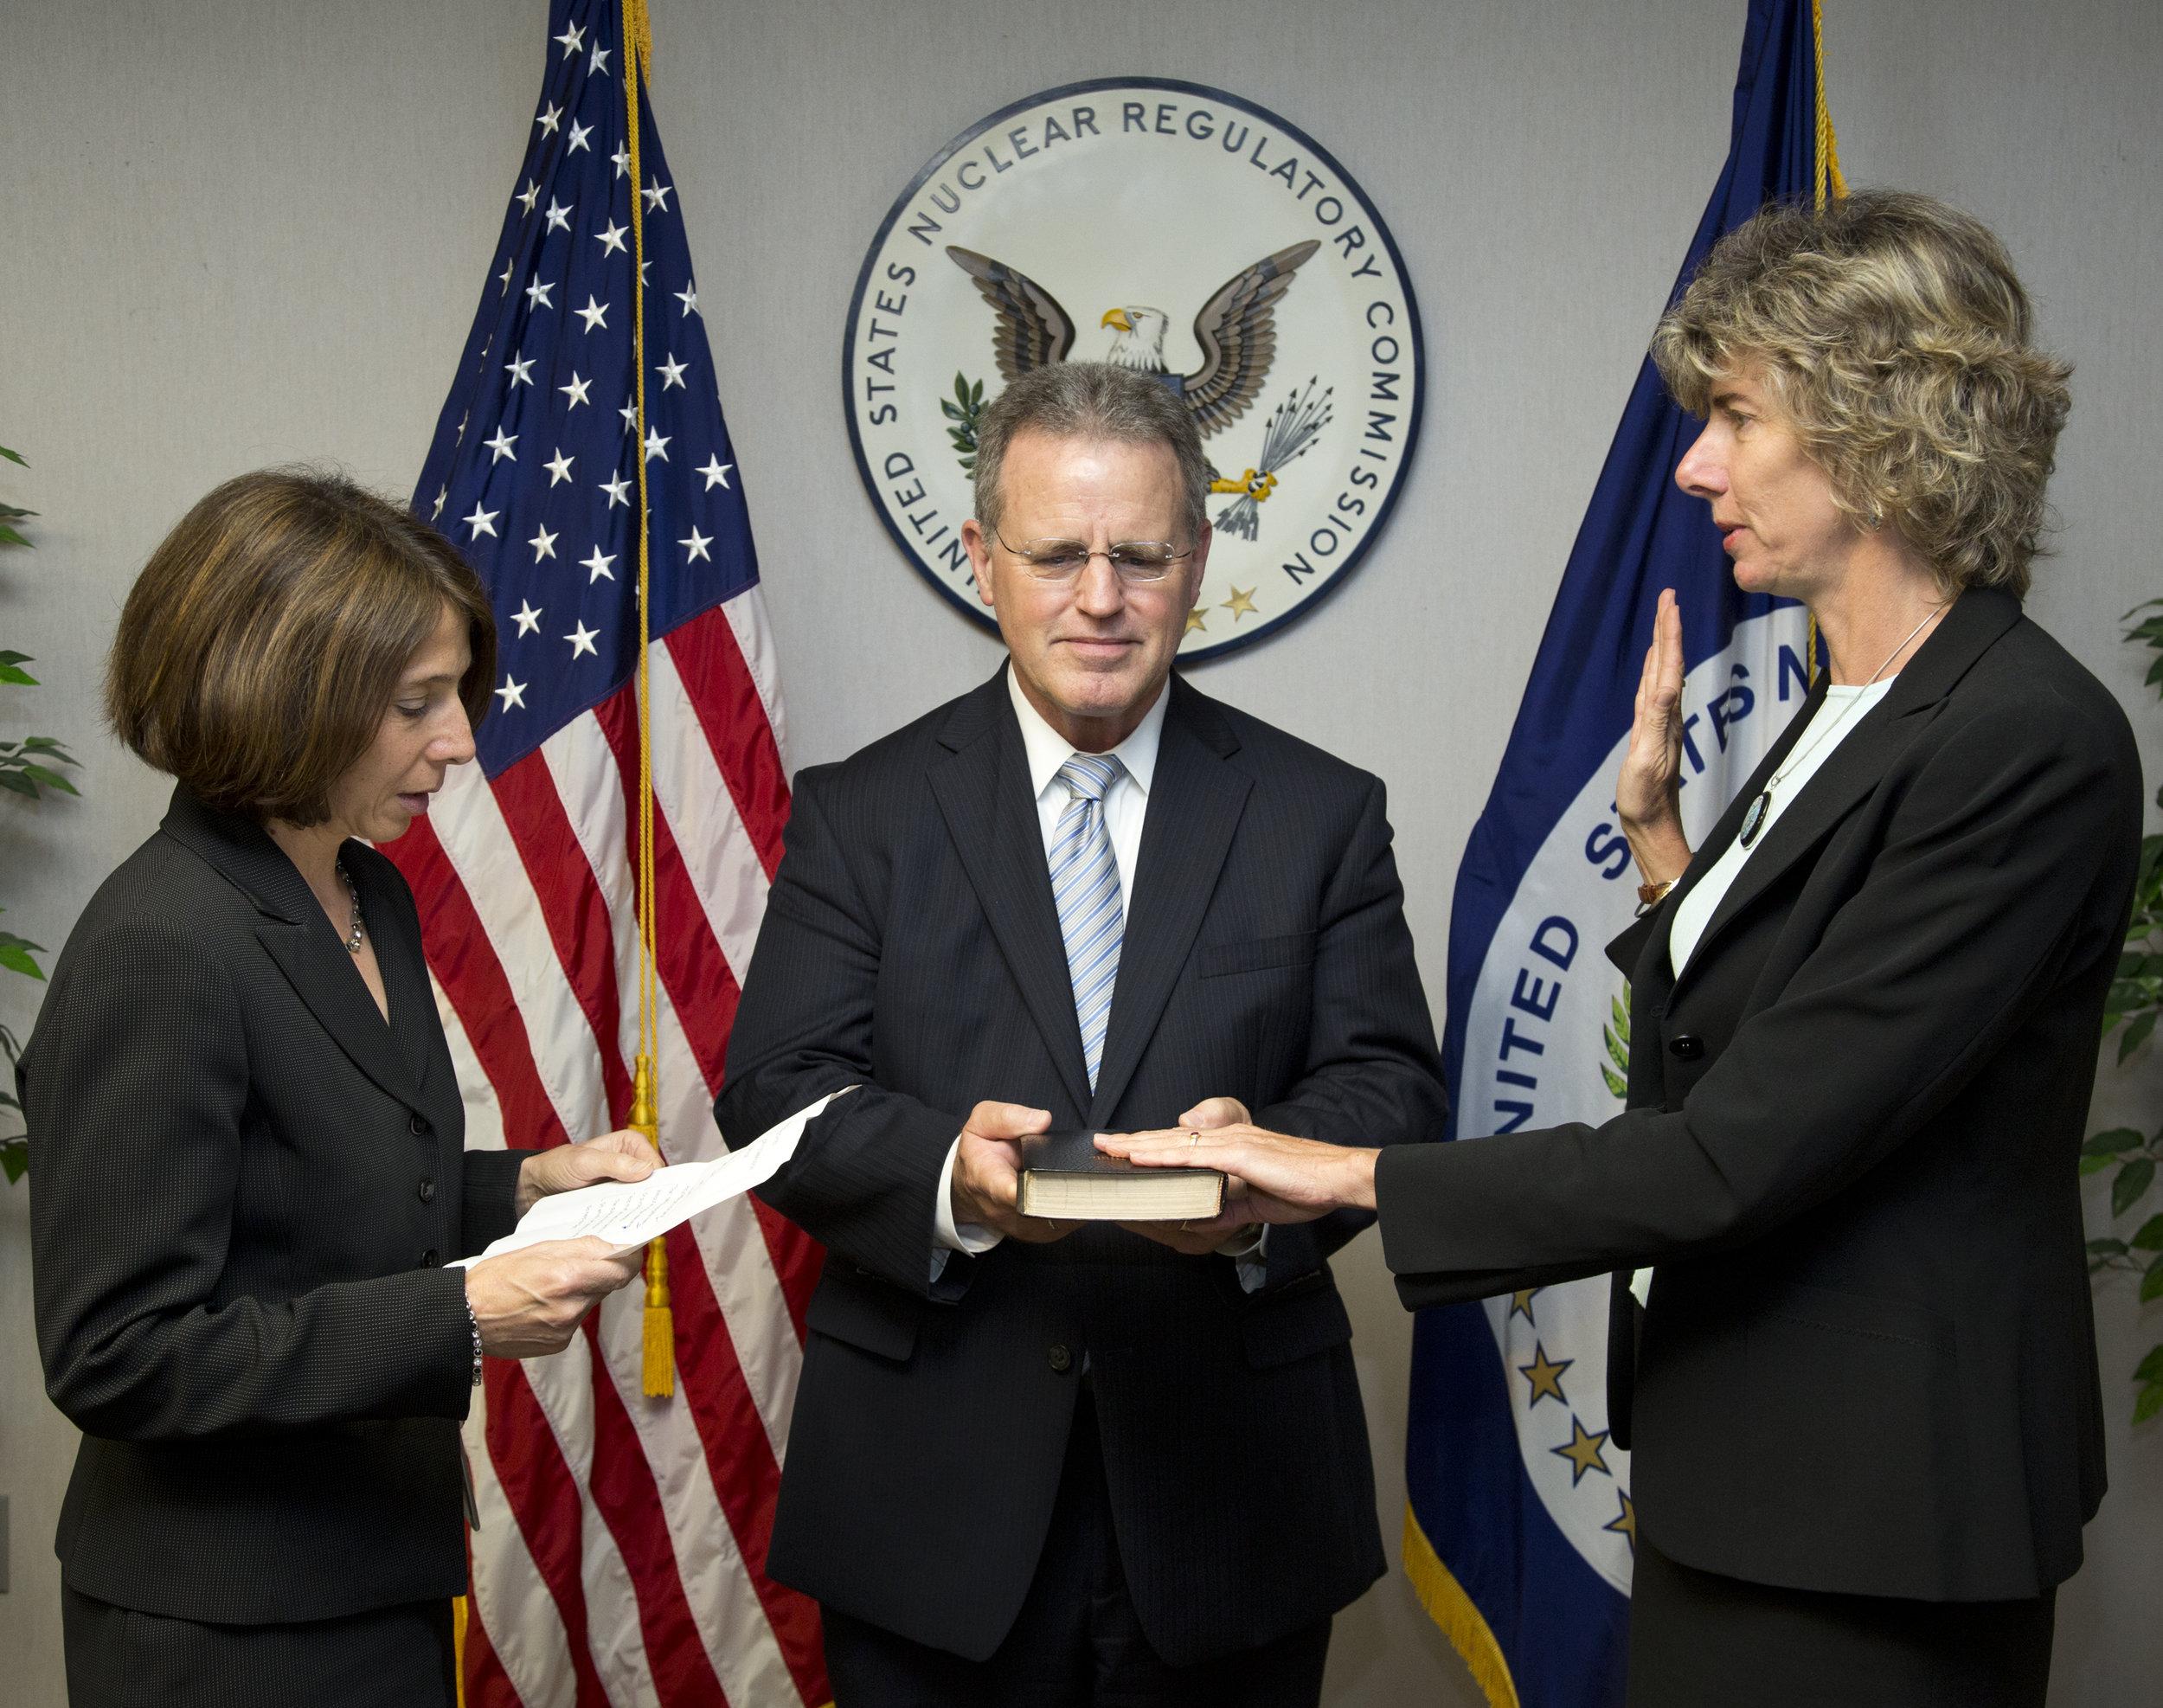 2012 07 Swearing In of Chairman Allison Macfarlane       014.jpg